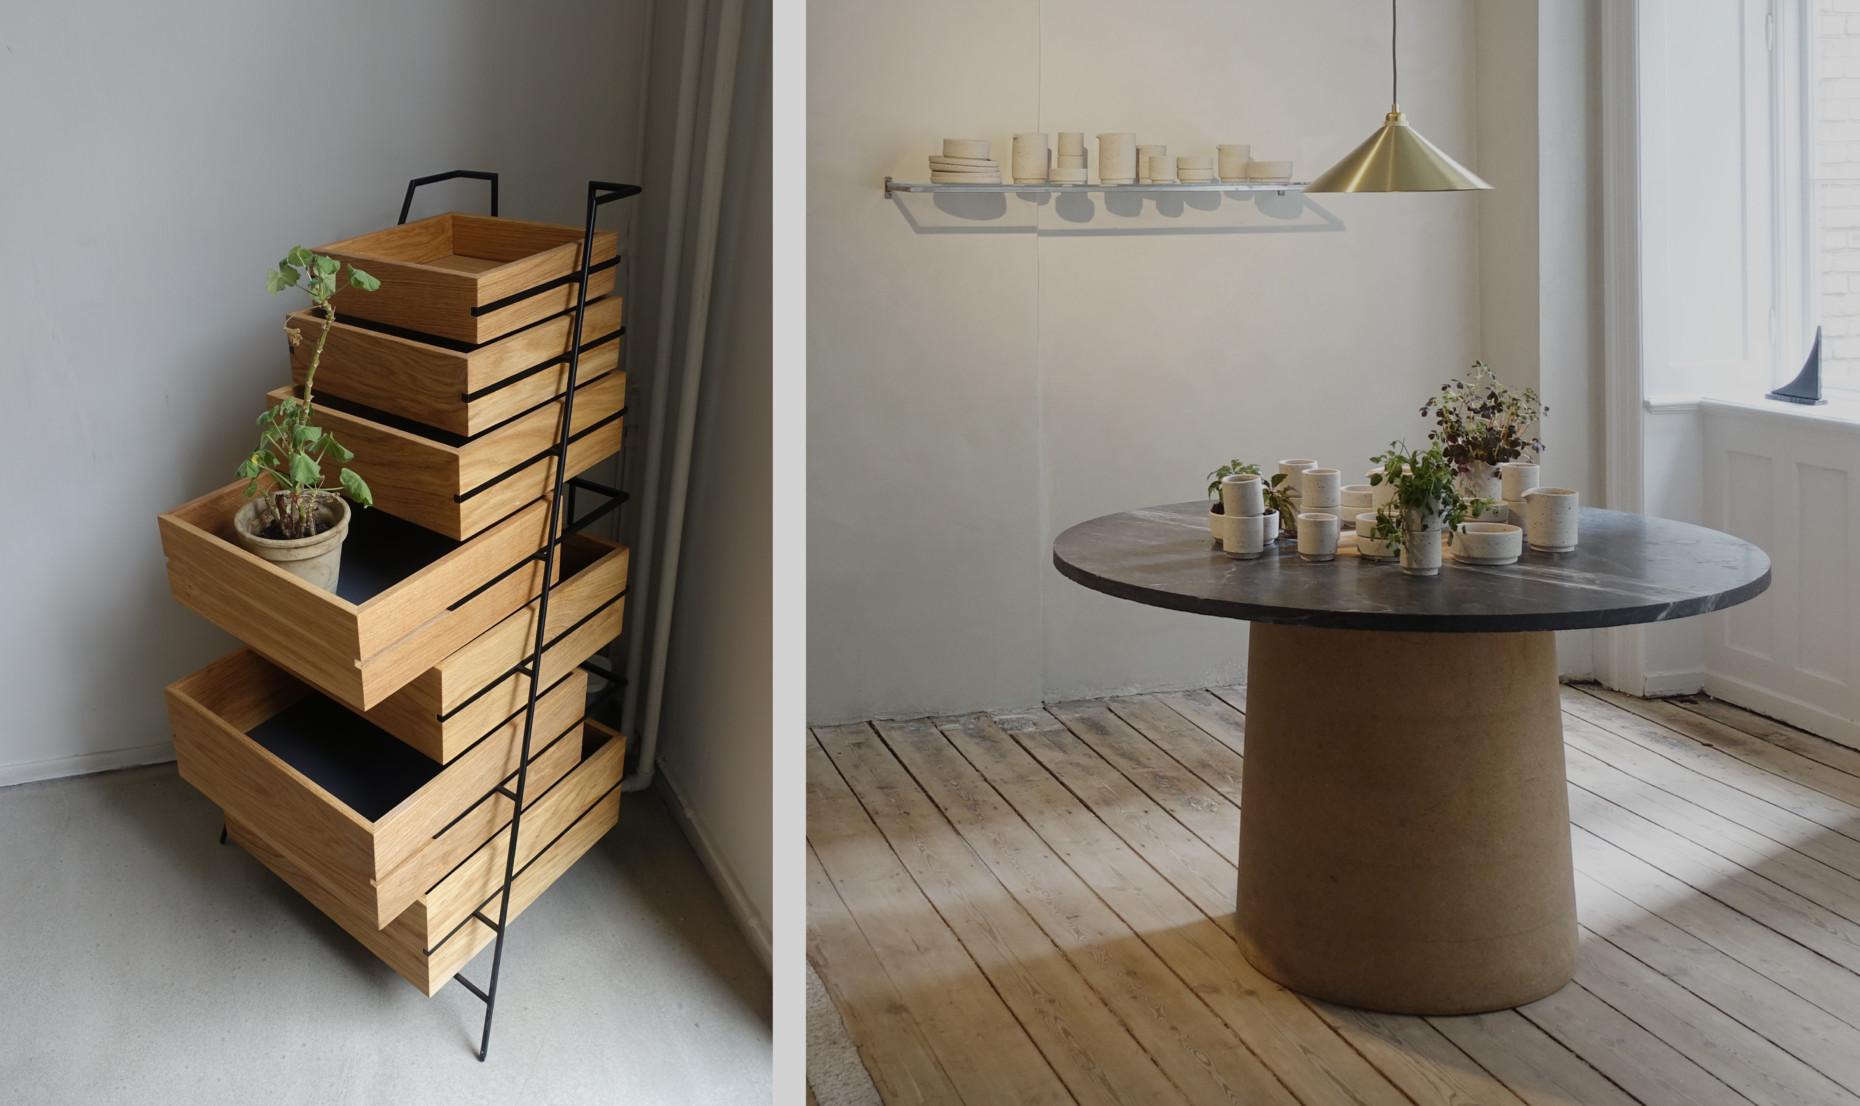 Designstudio FRAMA Products on display